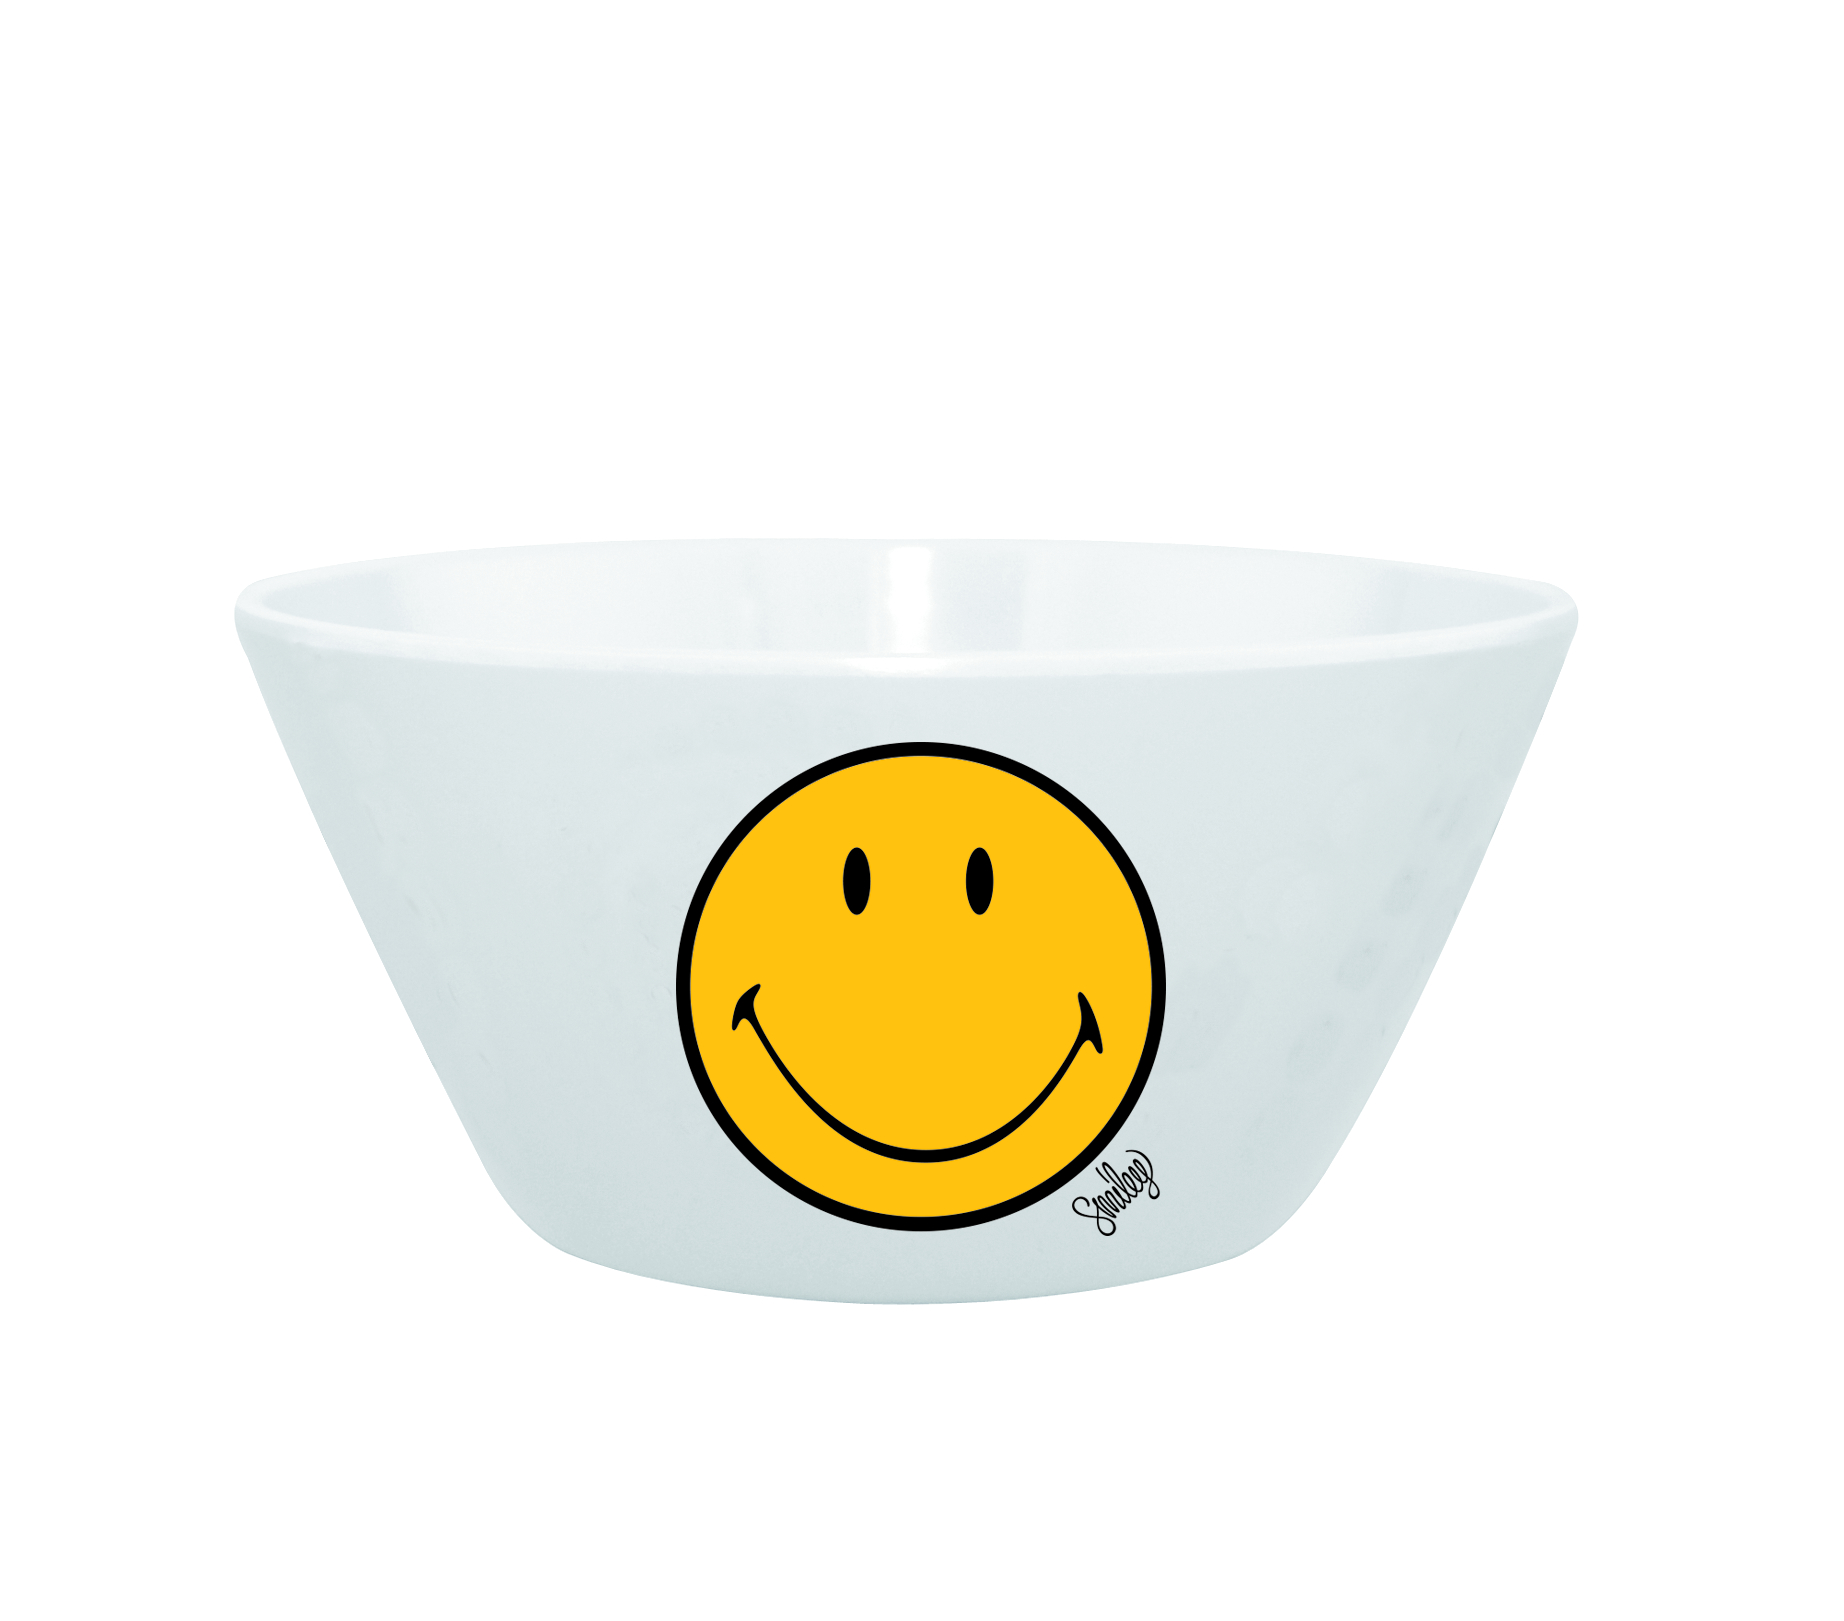 Mini Bol pentru cereale Smiley Galben/Alb O15 cm